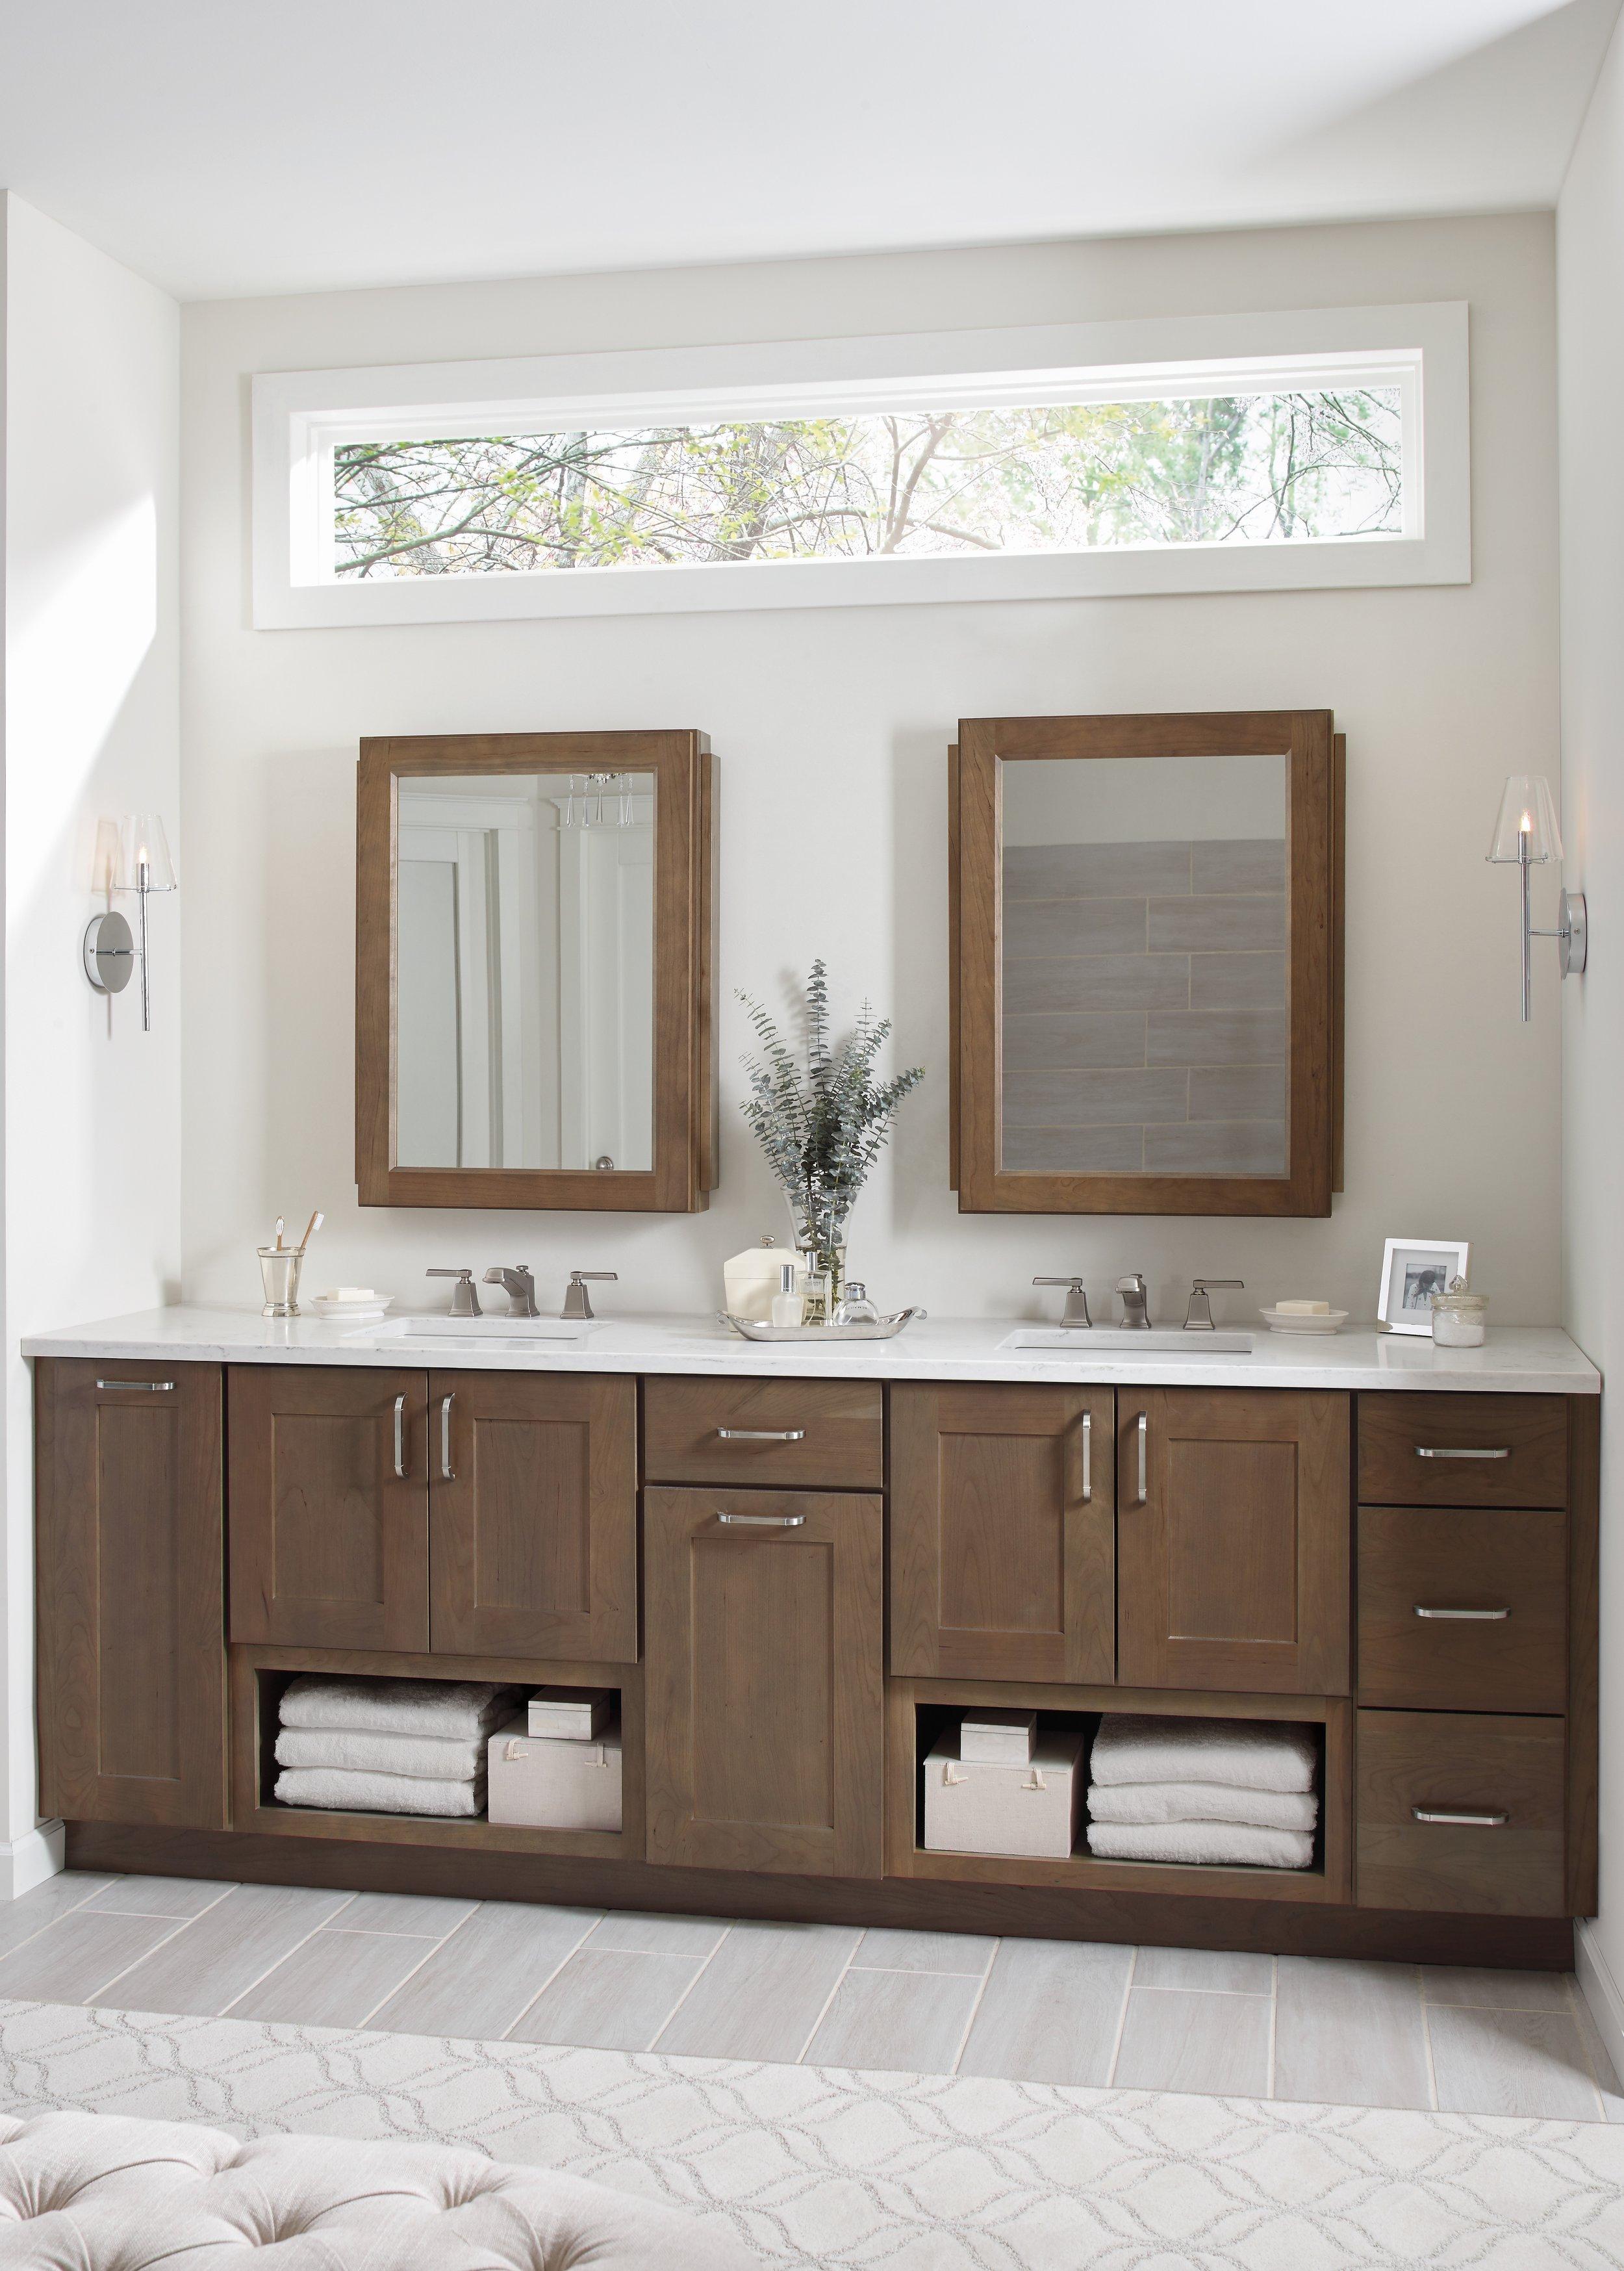 Nicole Janes Design Diamond Cabinets Wood Master Bathroom Double Vanity Medicine Cabinets